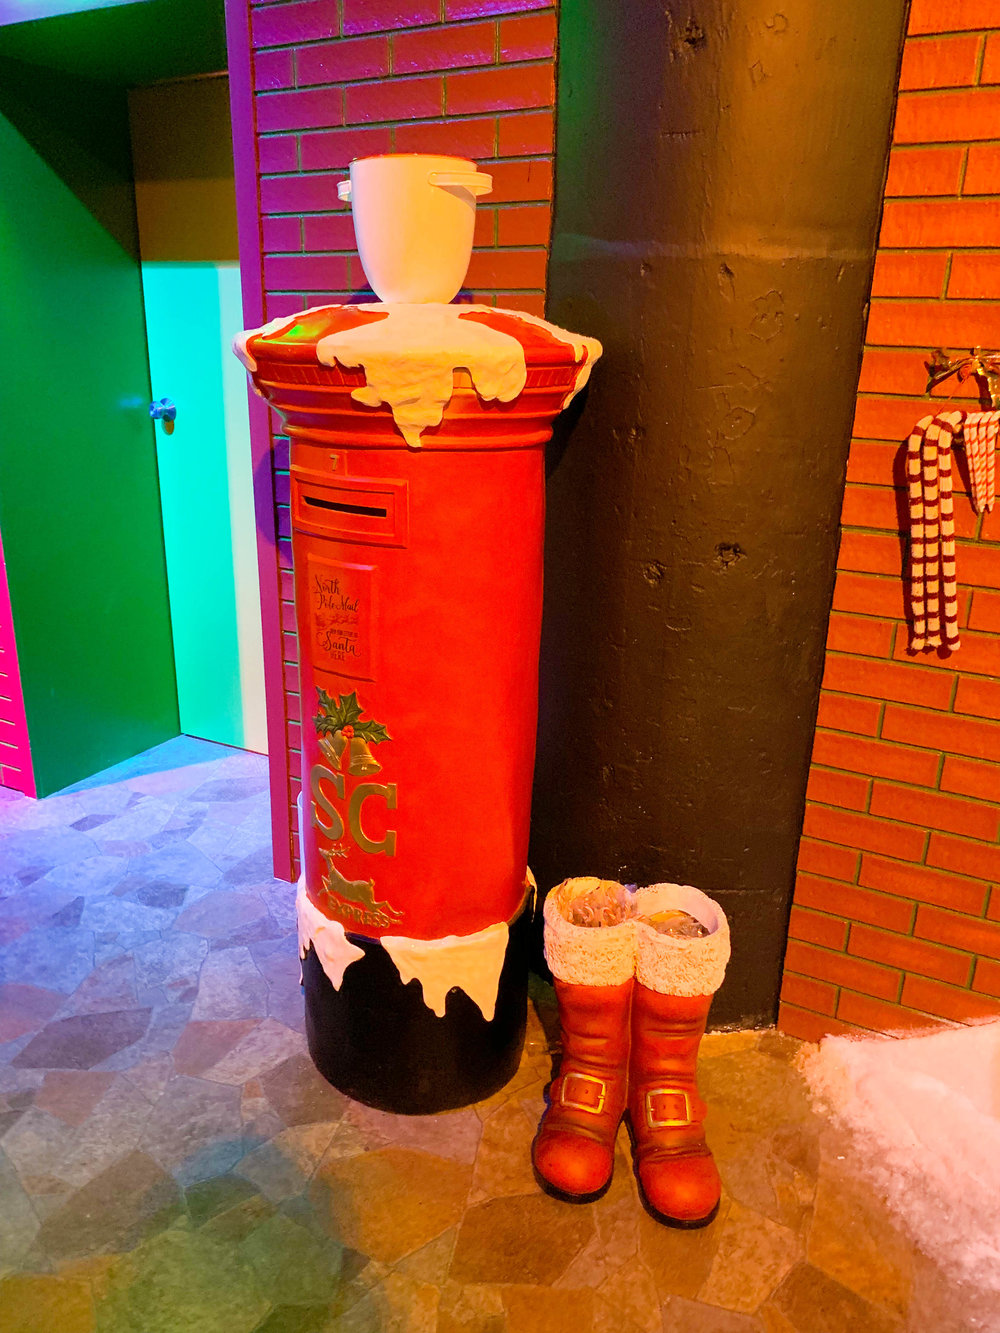 Fa la land - Christmas Pop-up in Downtown LA Christmas Town Santa's Mailbox